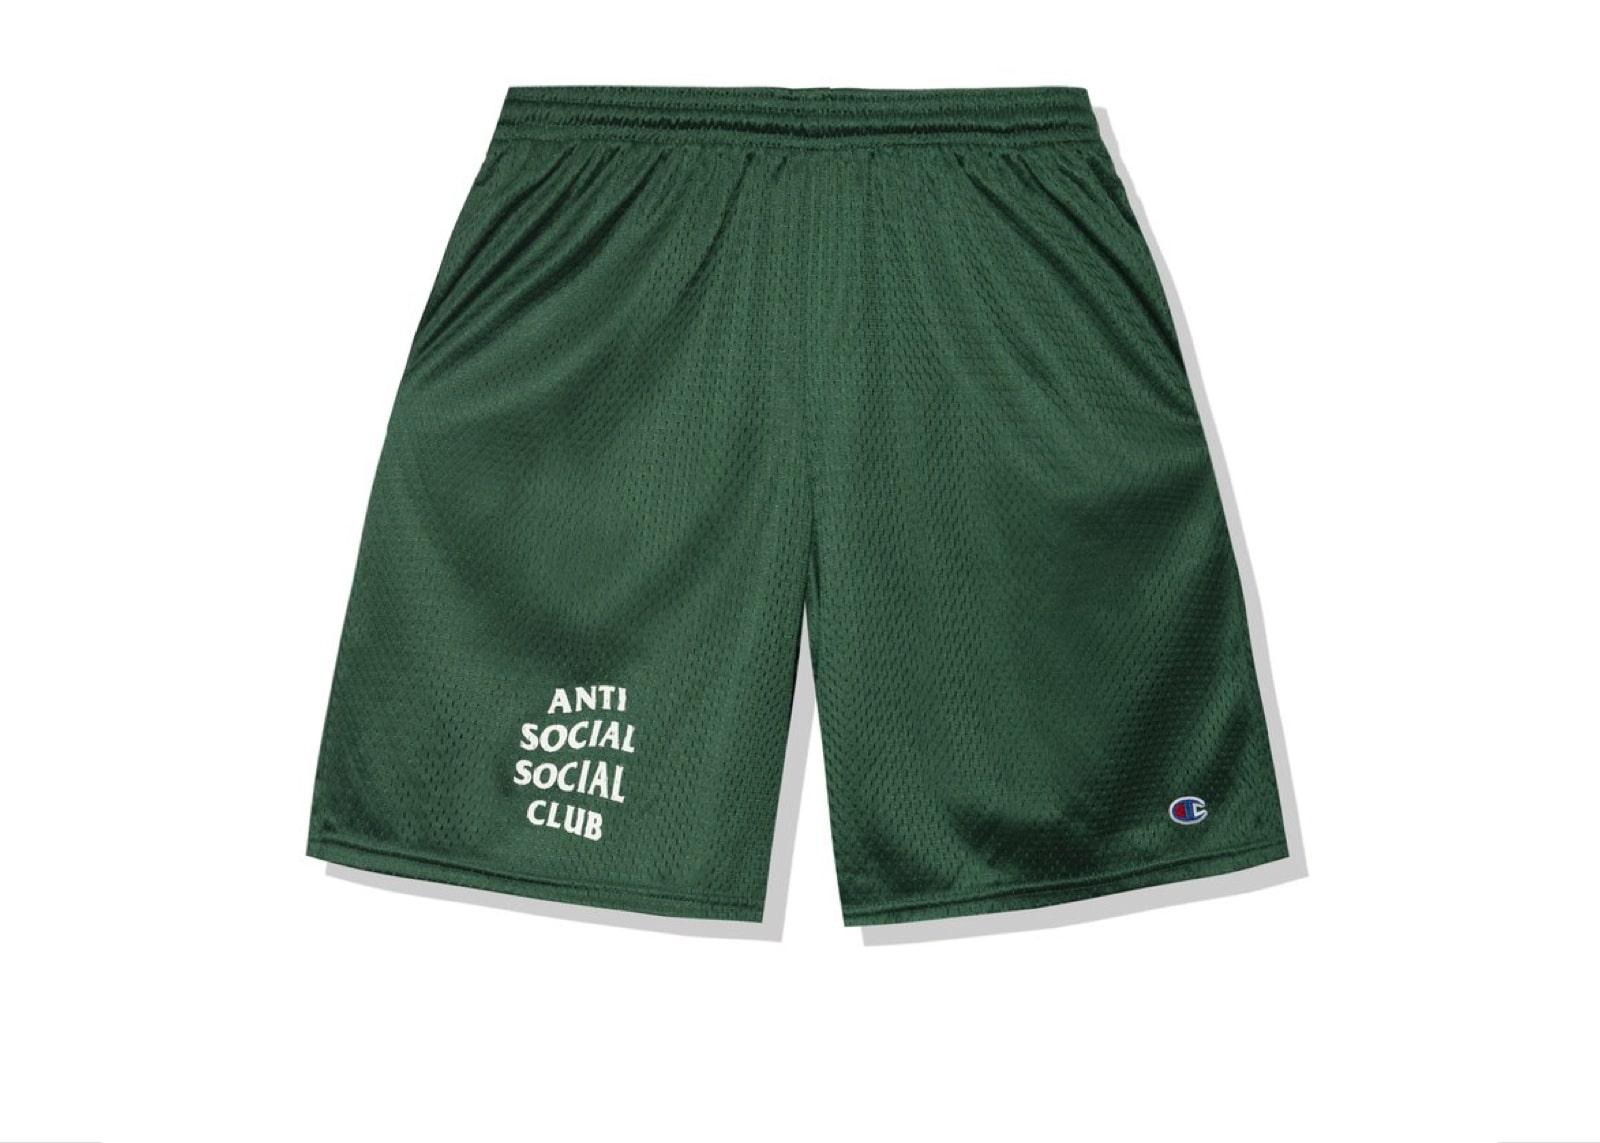 slide 1 - Sports Green Shorts